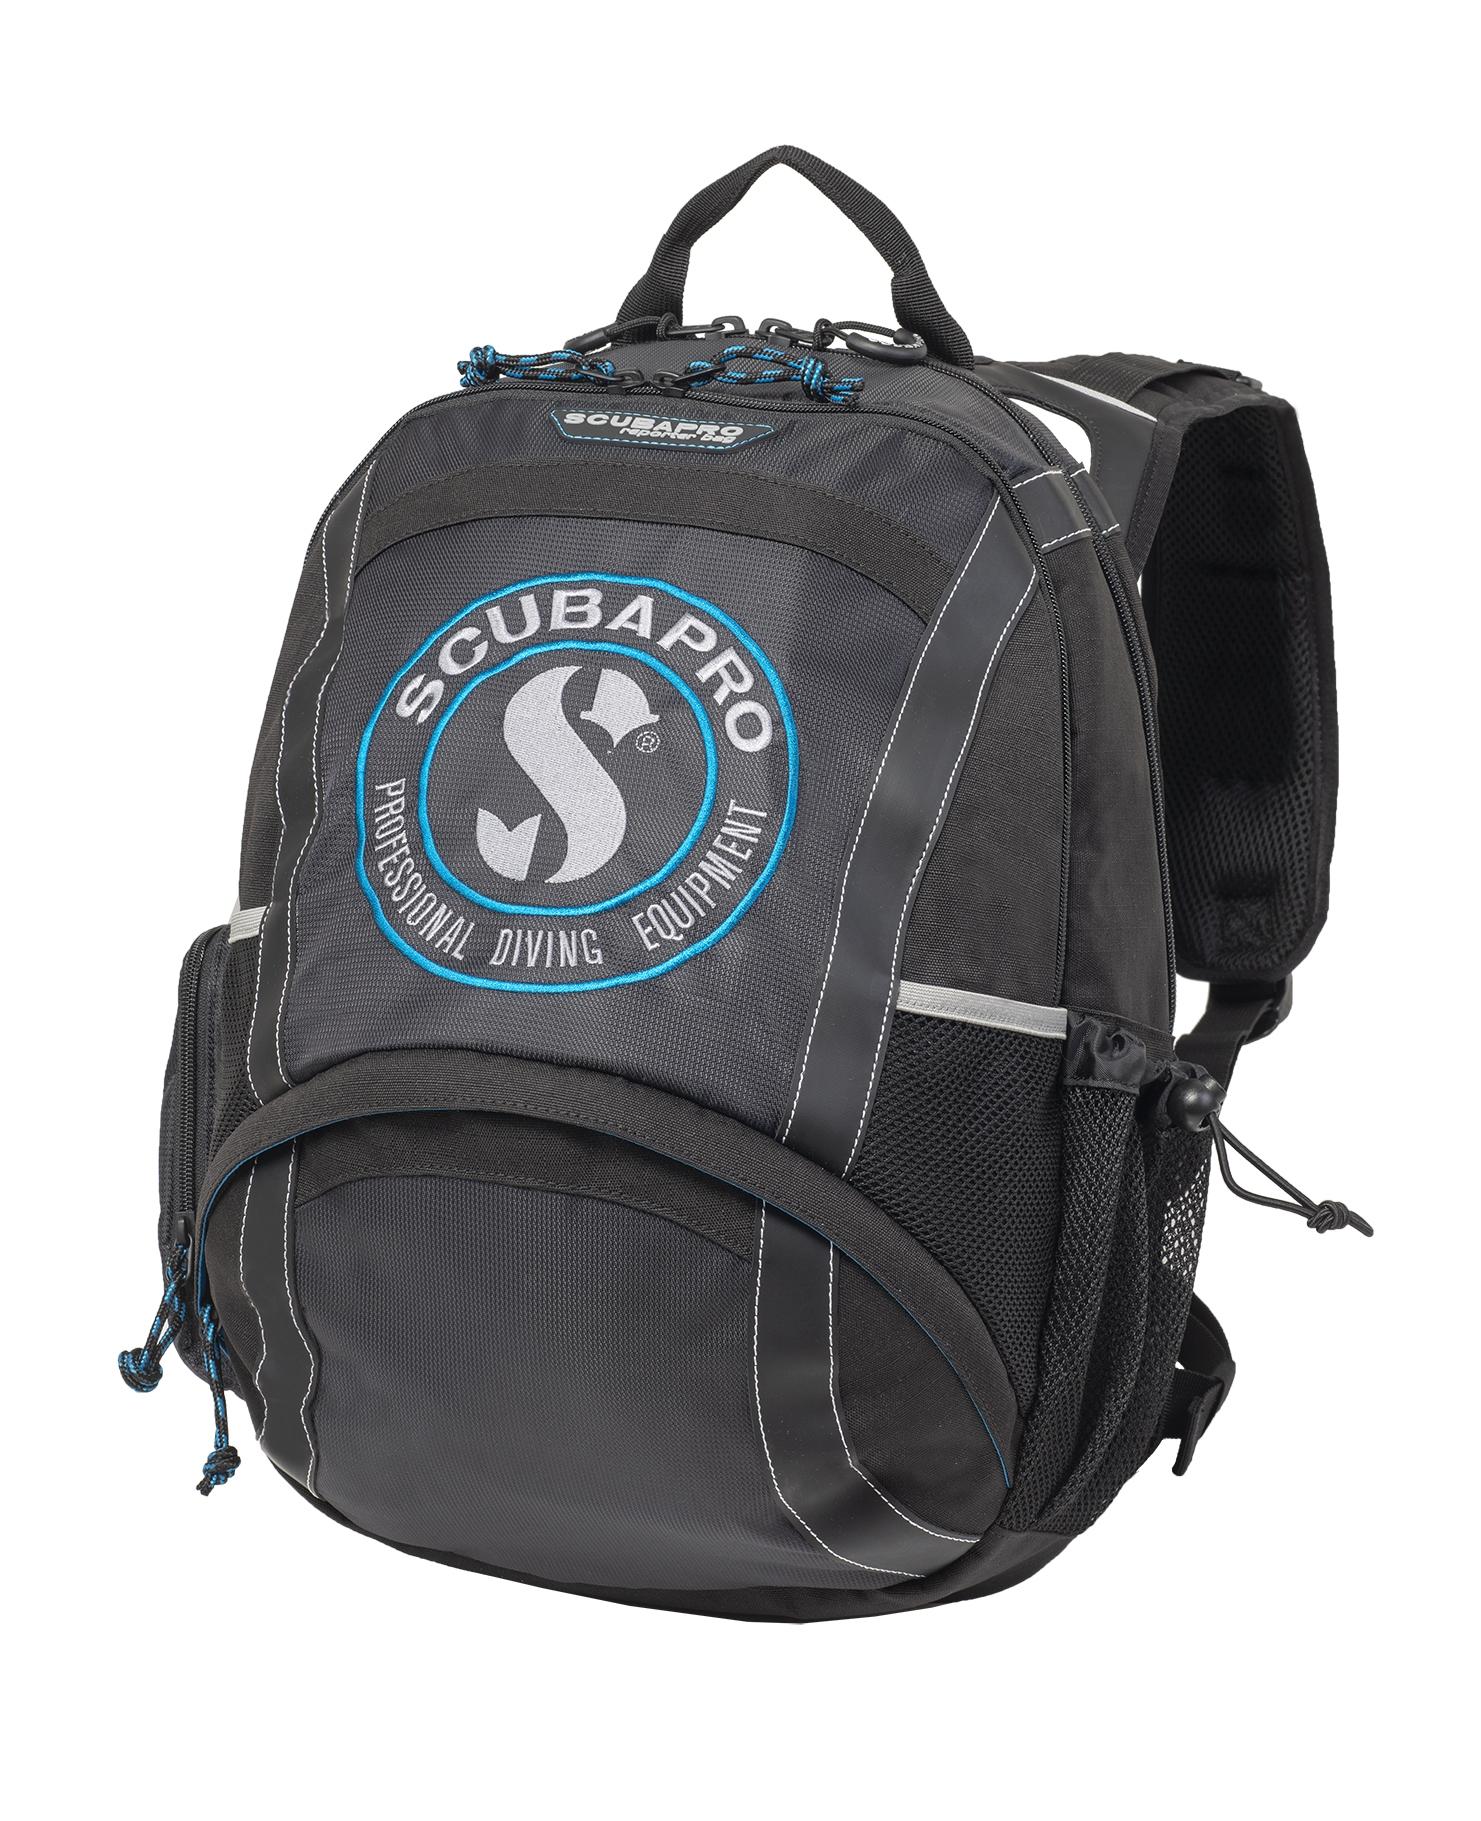 Reporter Bag, Scubapro